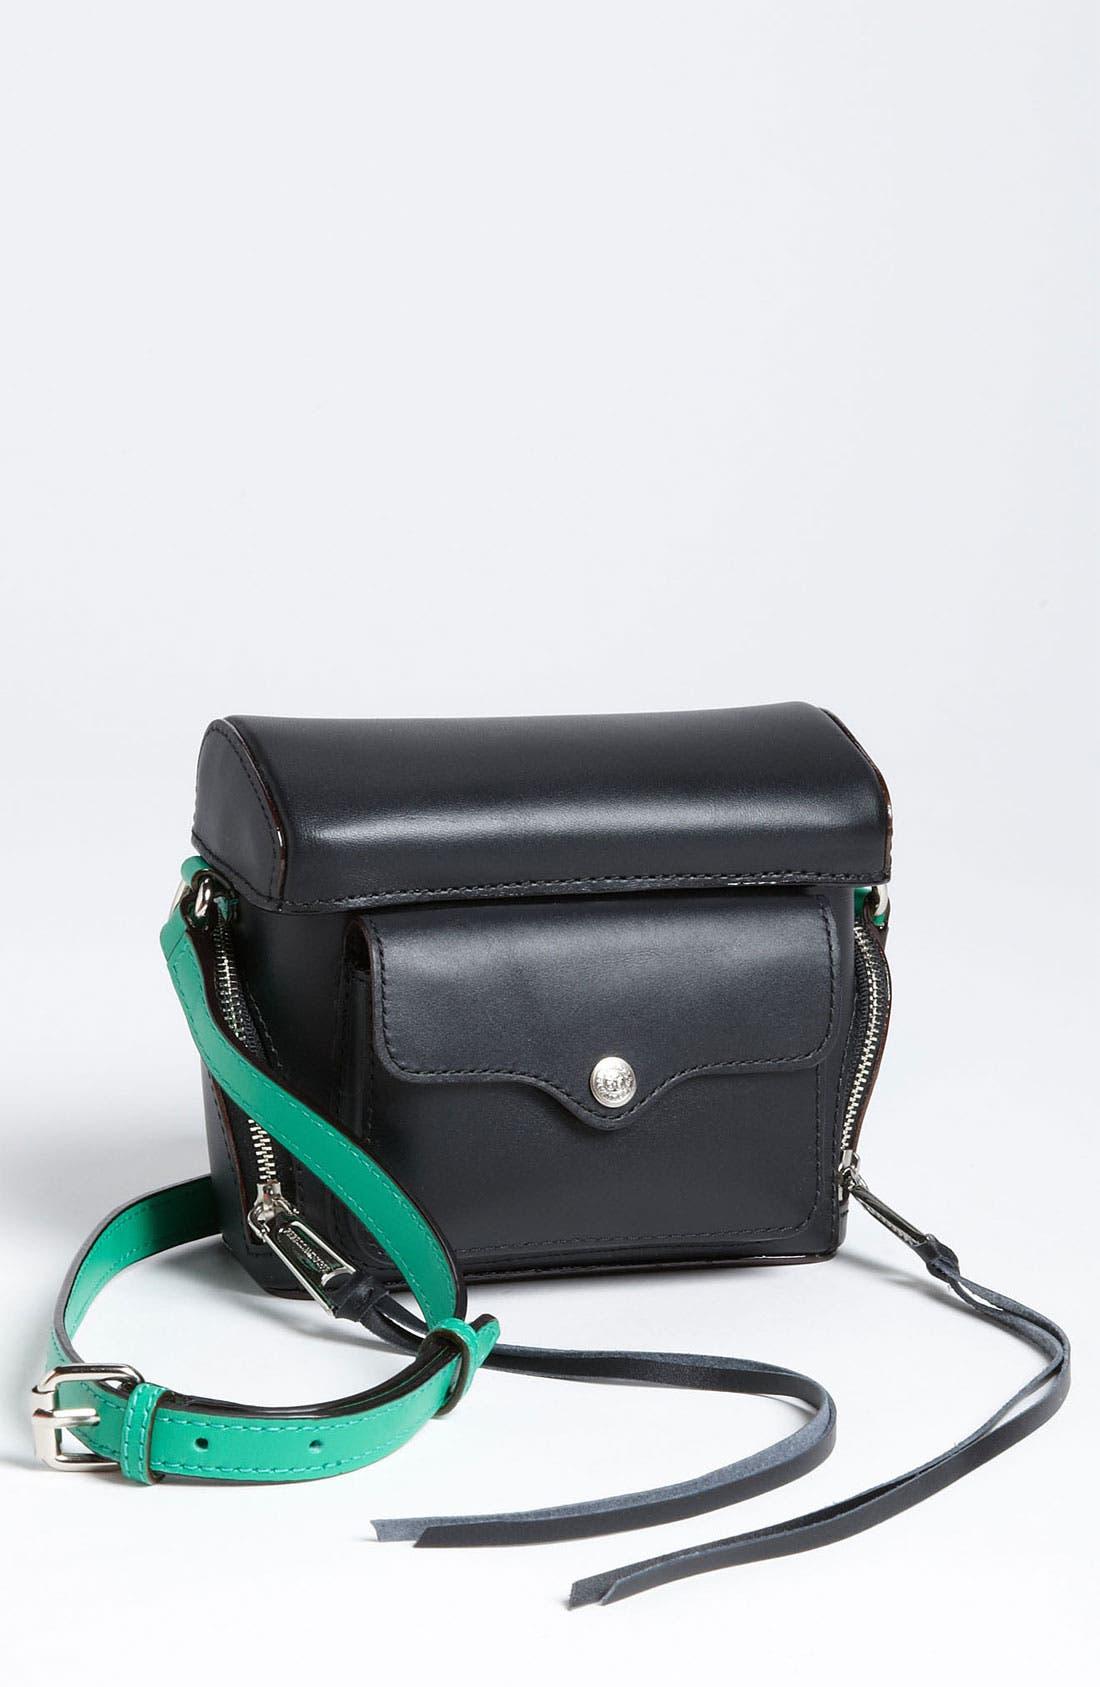 Alternate Image 1 Selected - Rebecca Minkoff 'Craig' Crossbody Camera Bag